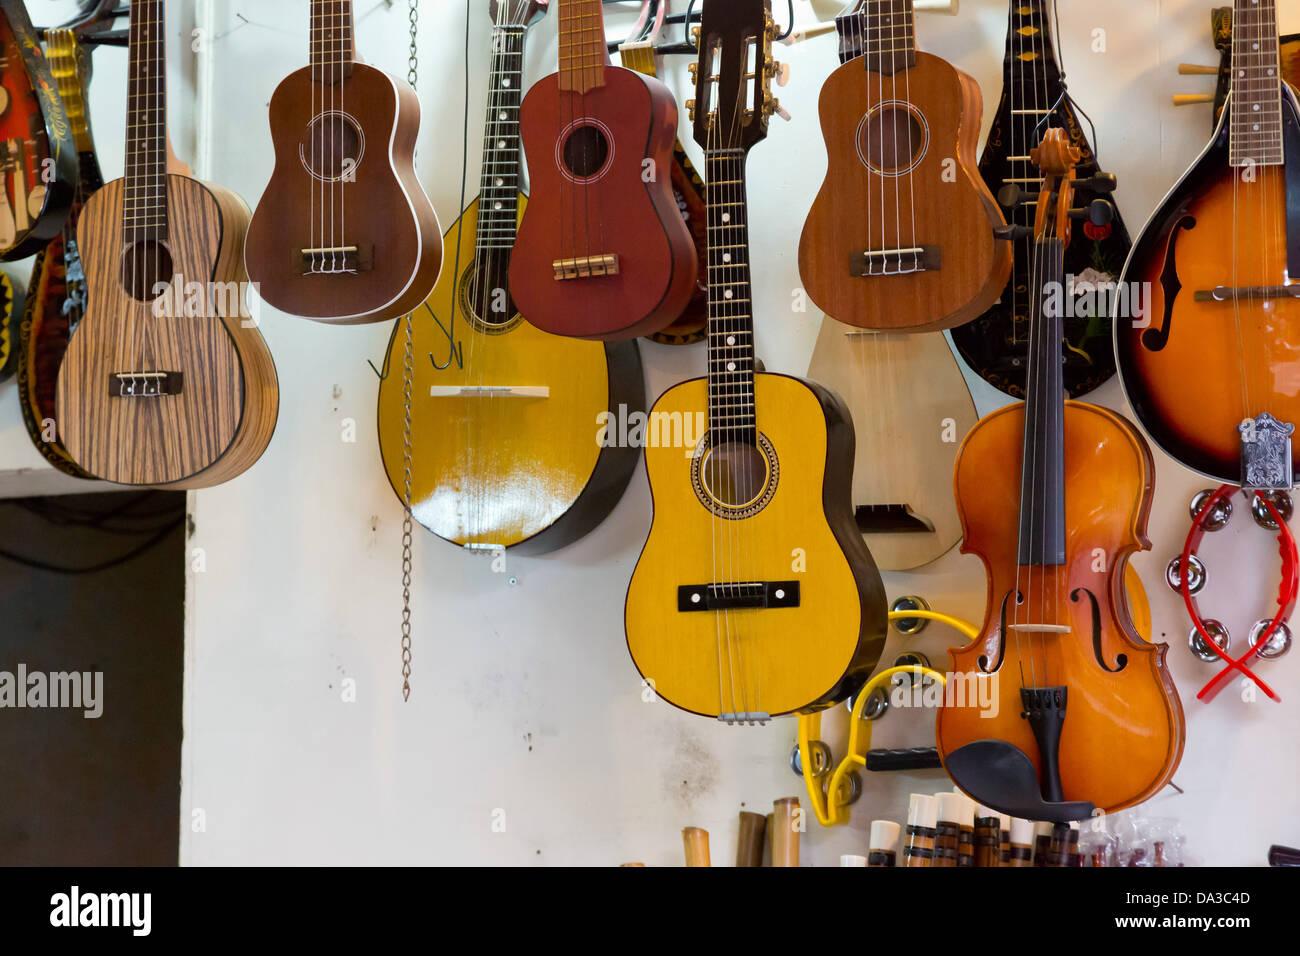 Guitars in the Old Quarter of Hanoi, Vietnam Stock Photo